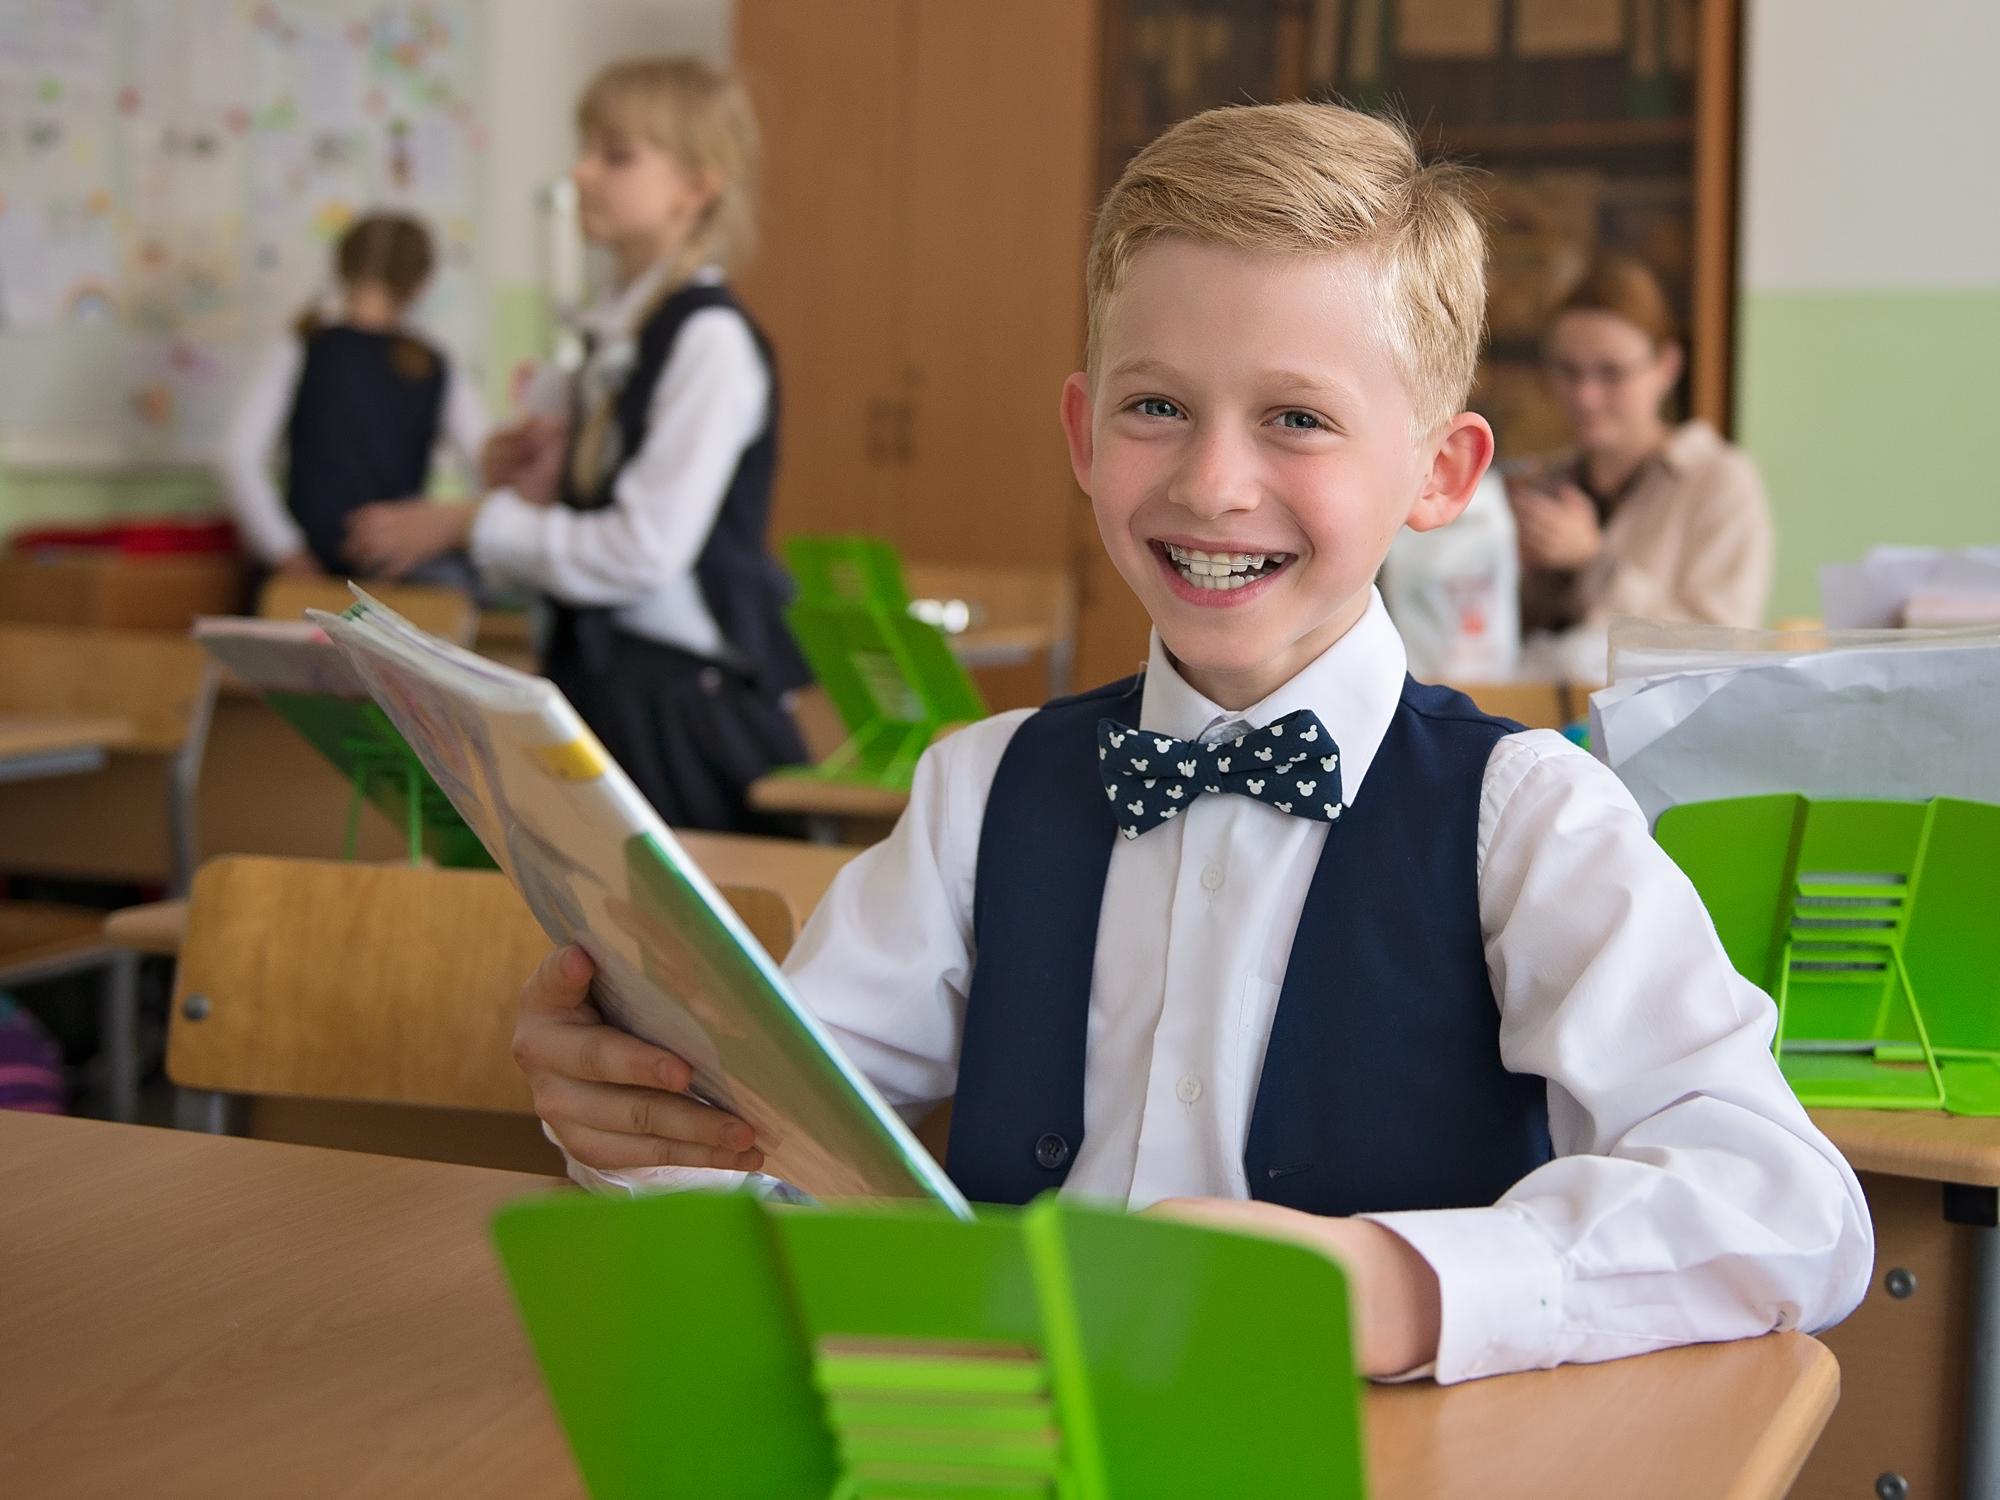 Фотосессия детей в классе, Москва